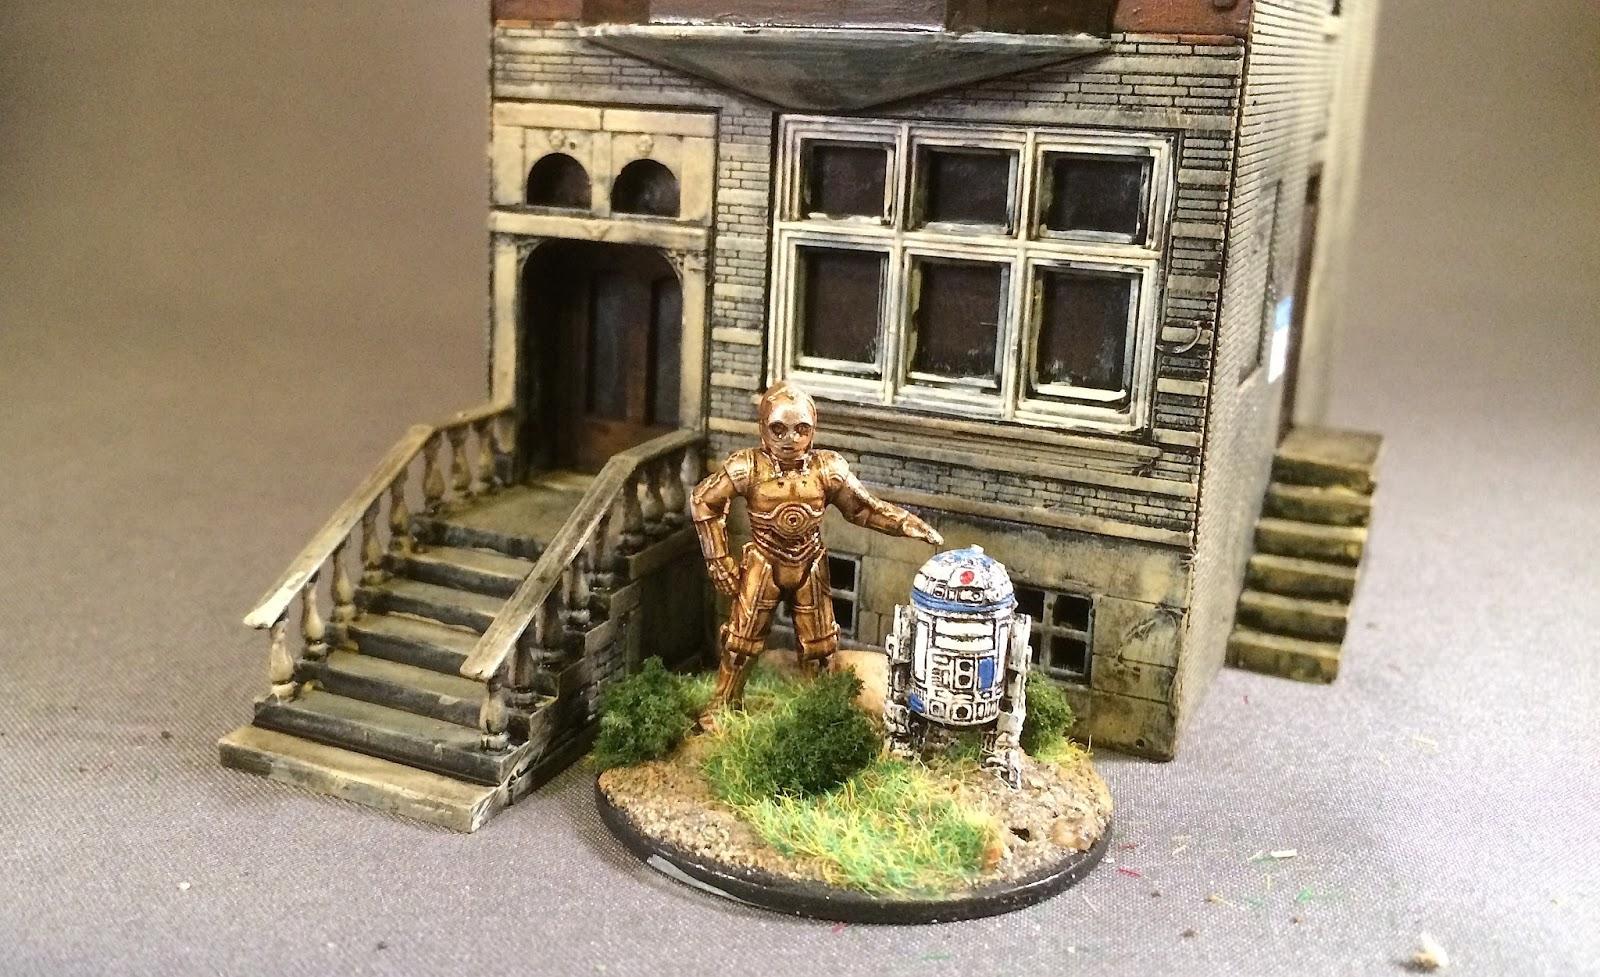 Bob S Miniature Wargaming Blog More Ho Scale Buildings